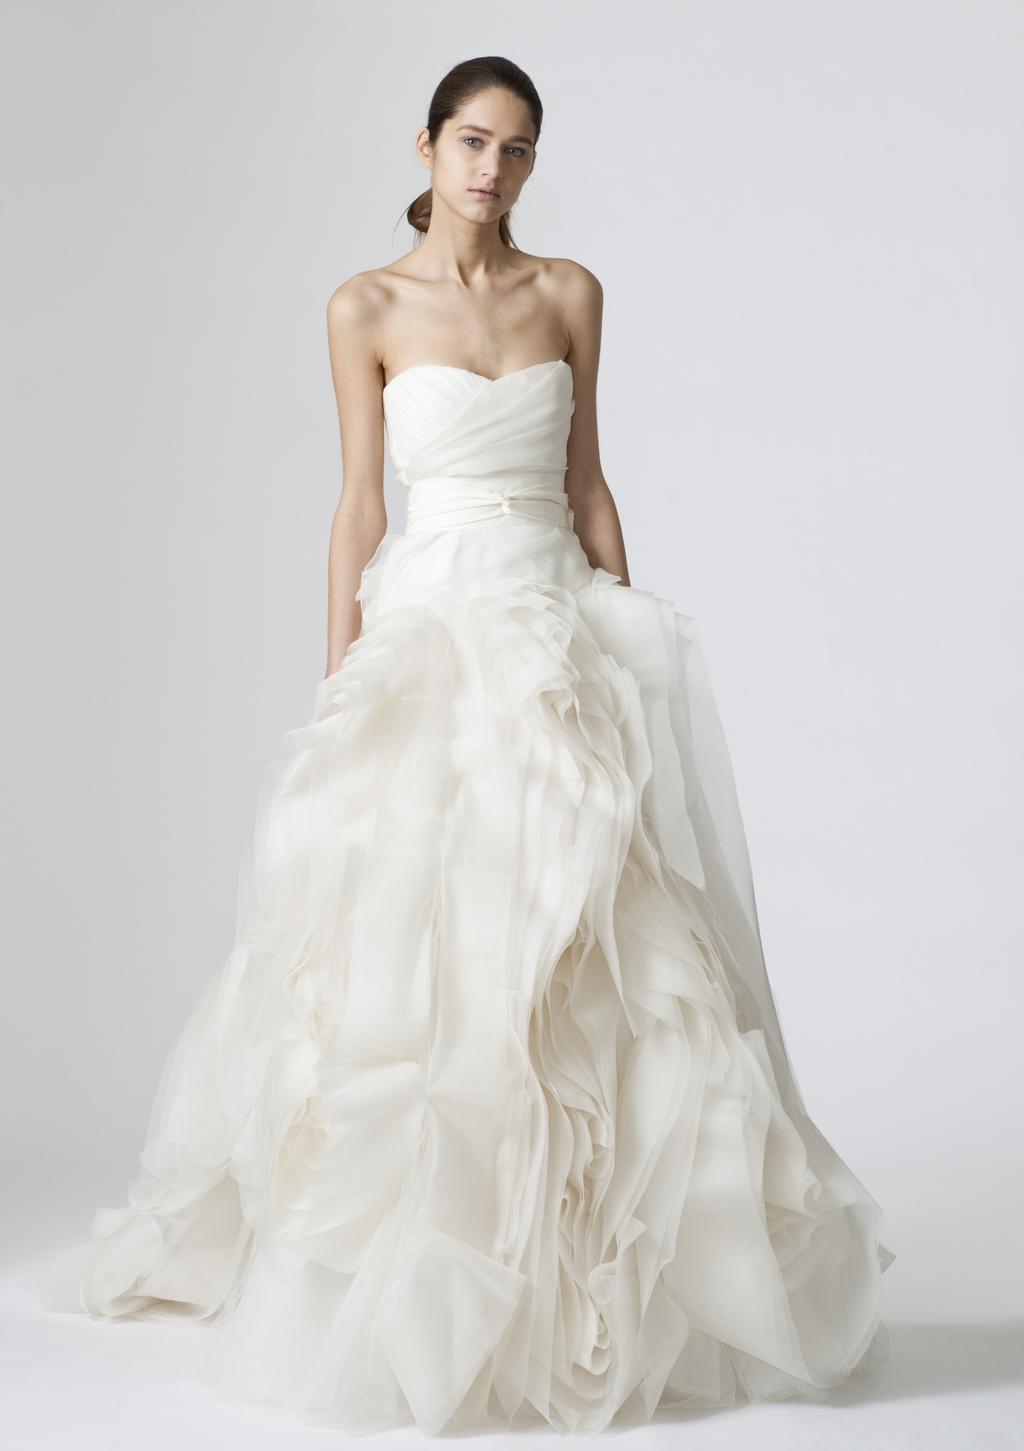 Vera-wang-wedding-dresses-spring-2010-12.full